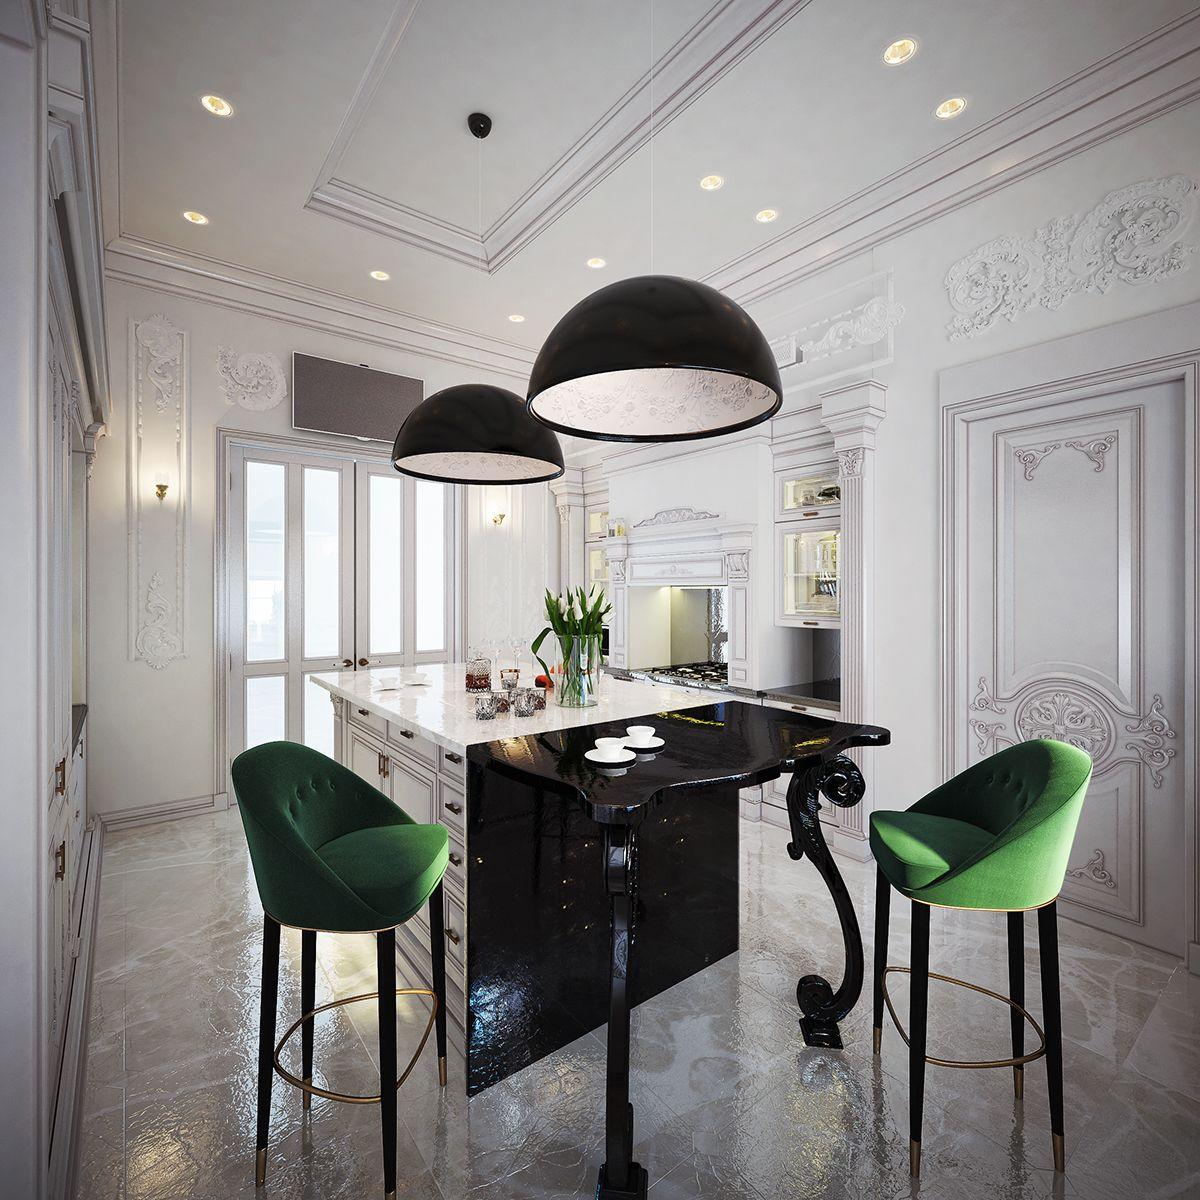 R Class Interior Design On Behance Interior Interior Design